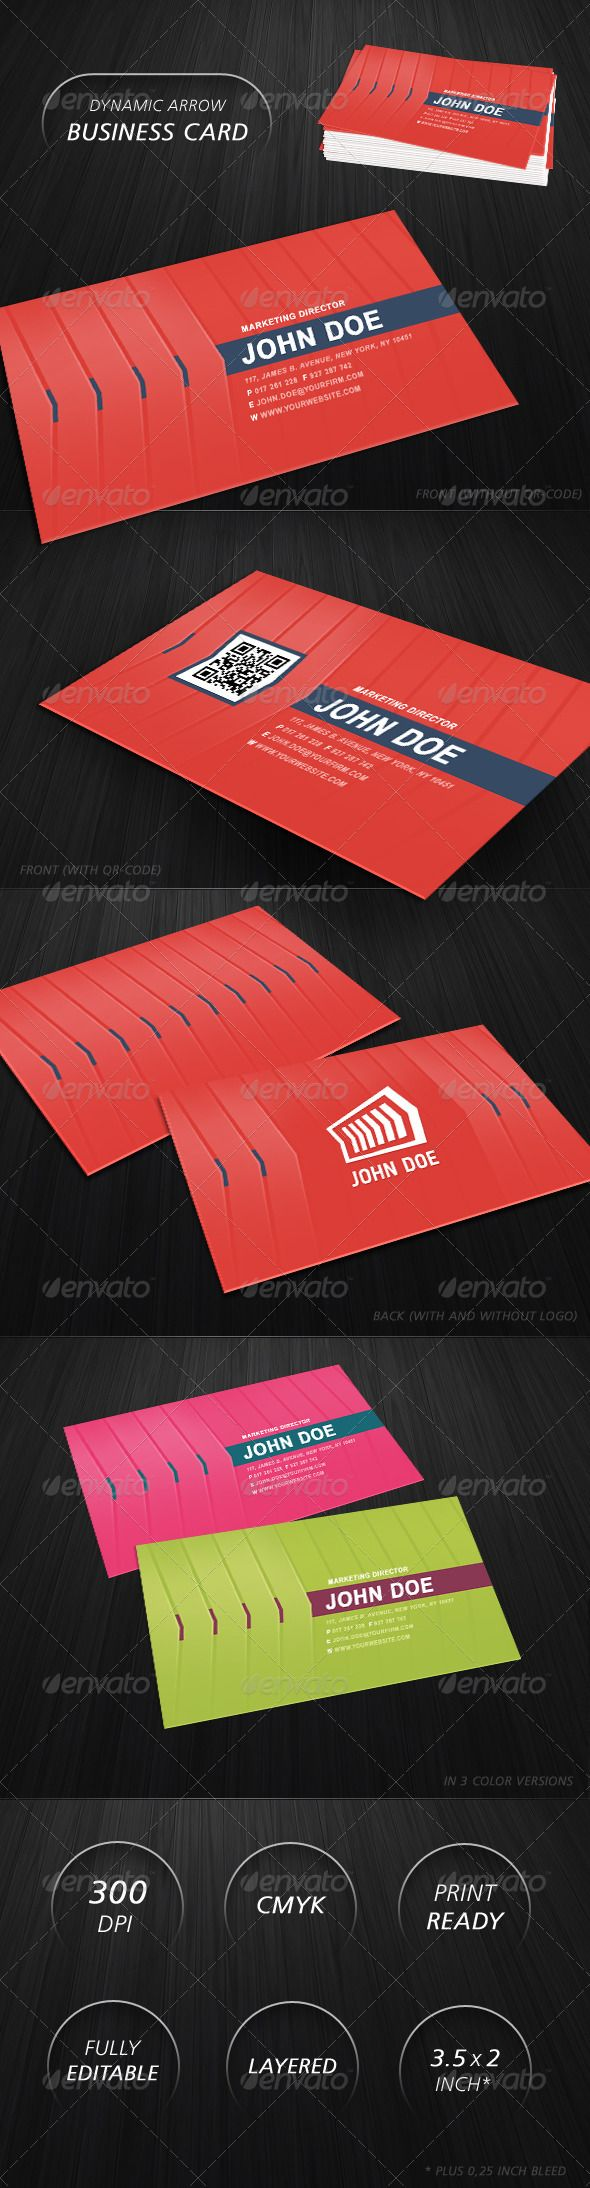 99 best print templates images on pinterest script fonts brand edit dynamic arrow business card magicingreecefo Gallery